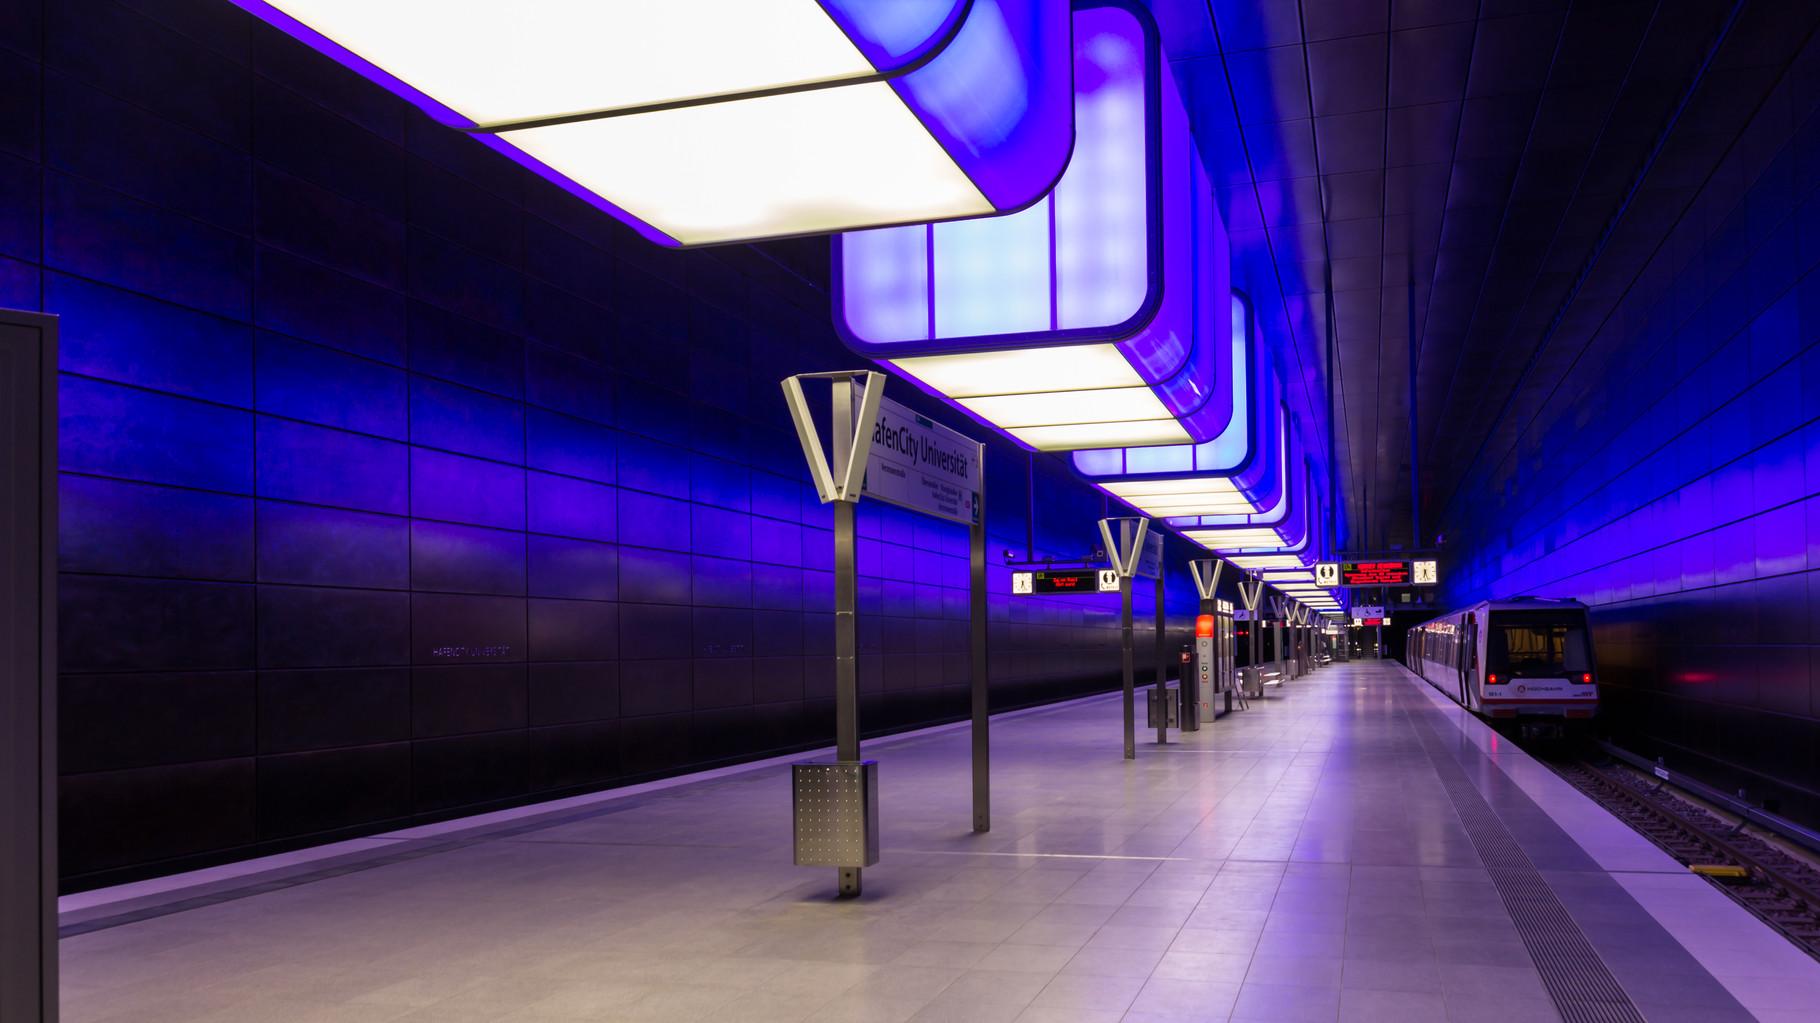 35_Hamburg - HafenCity Universität - U-Bahn.